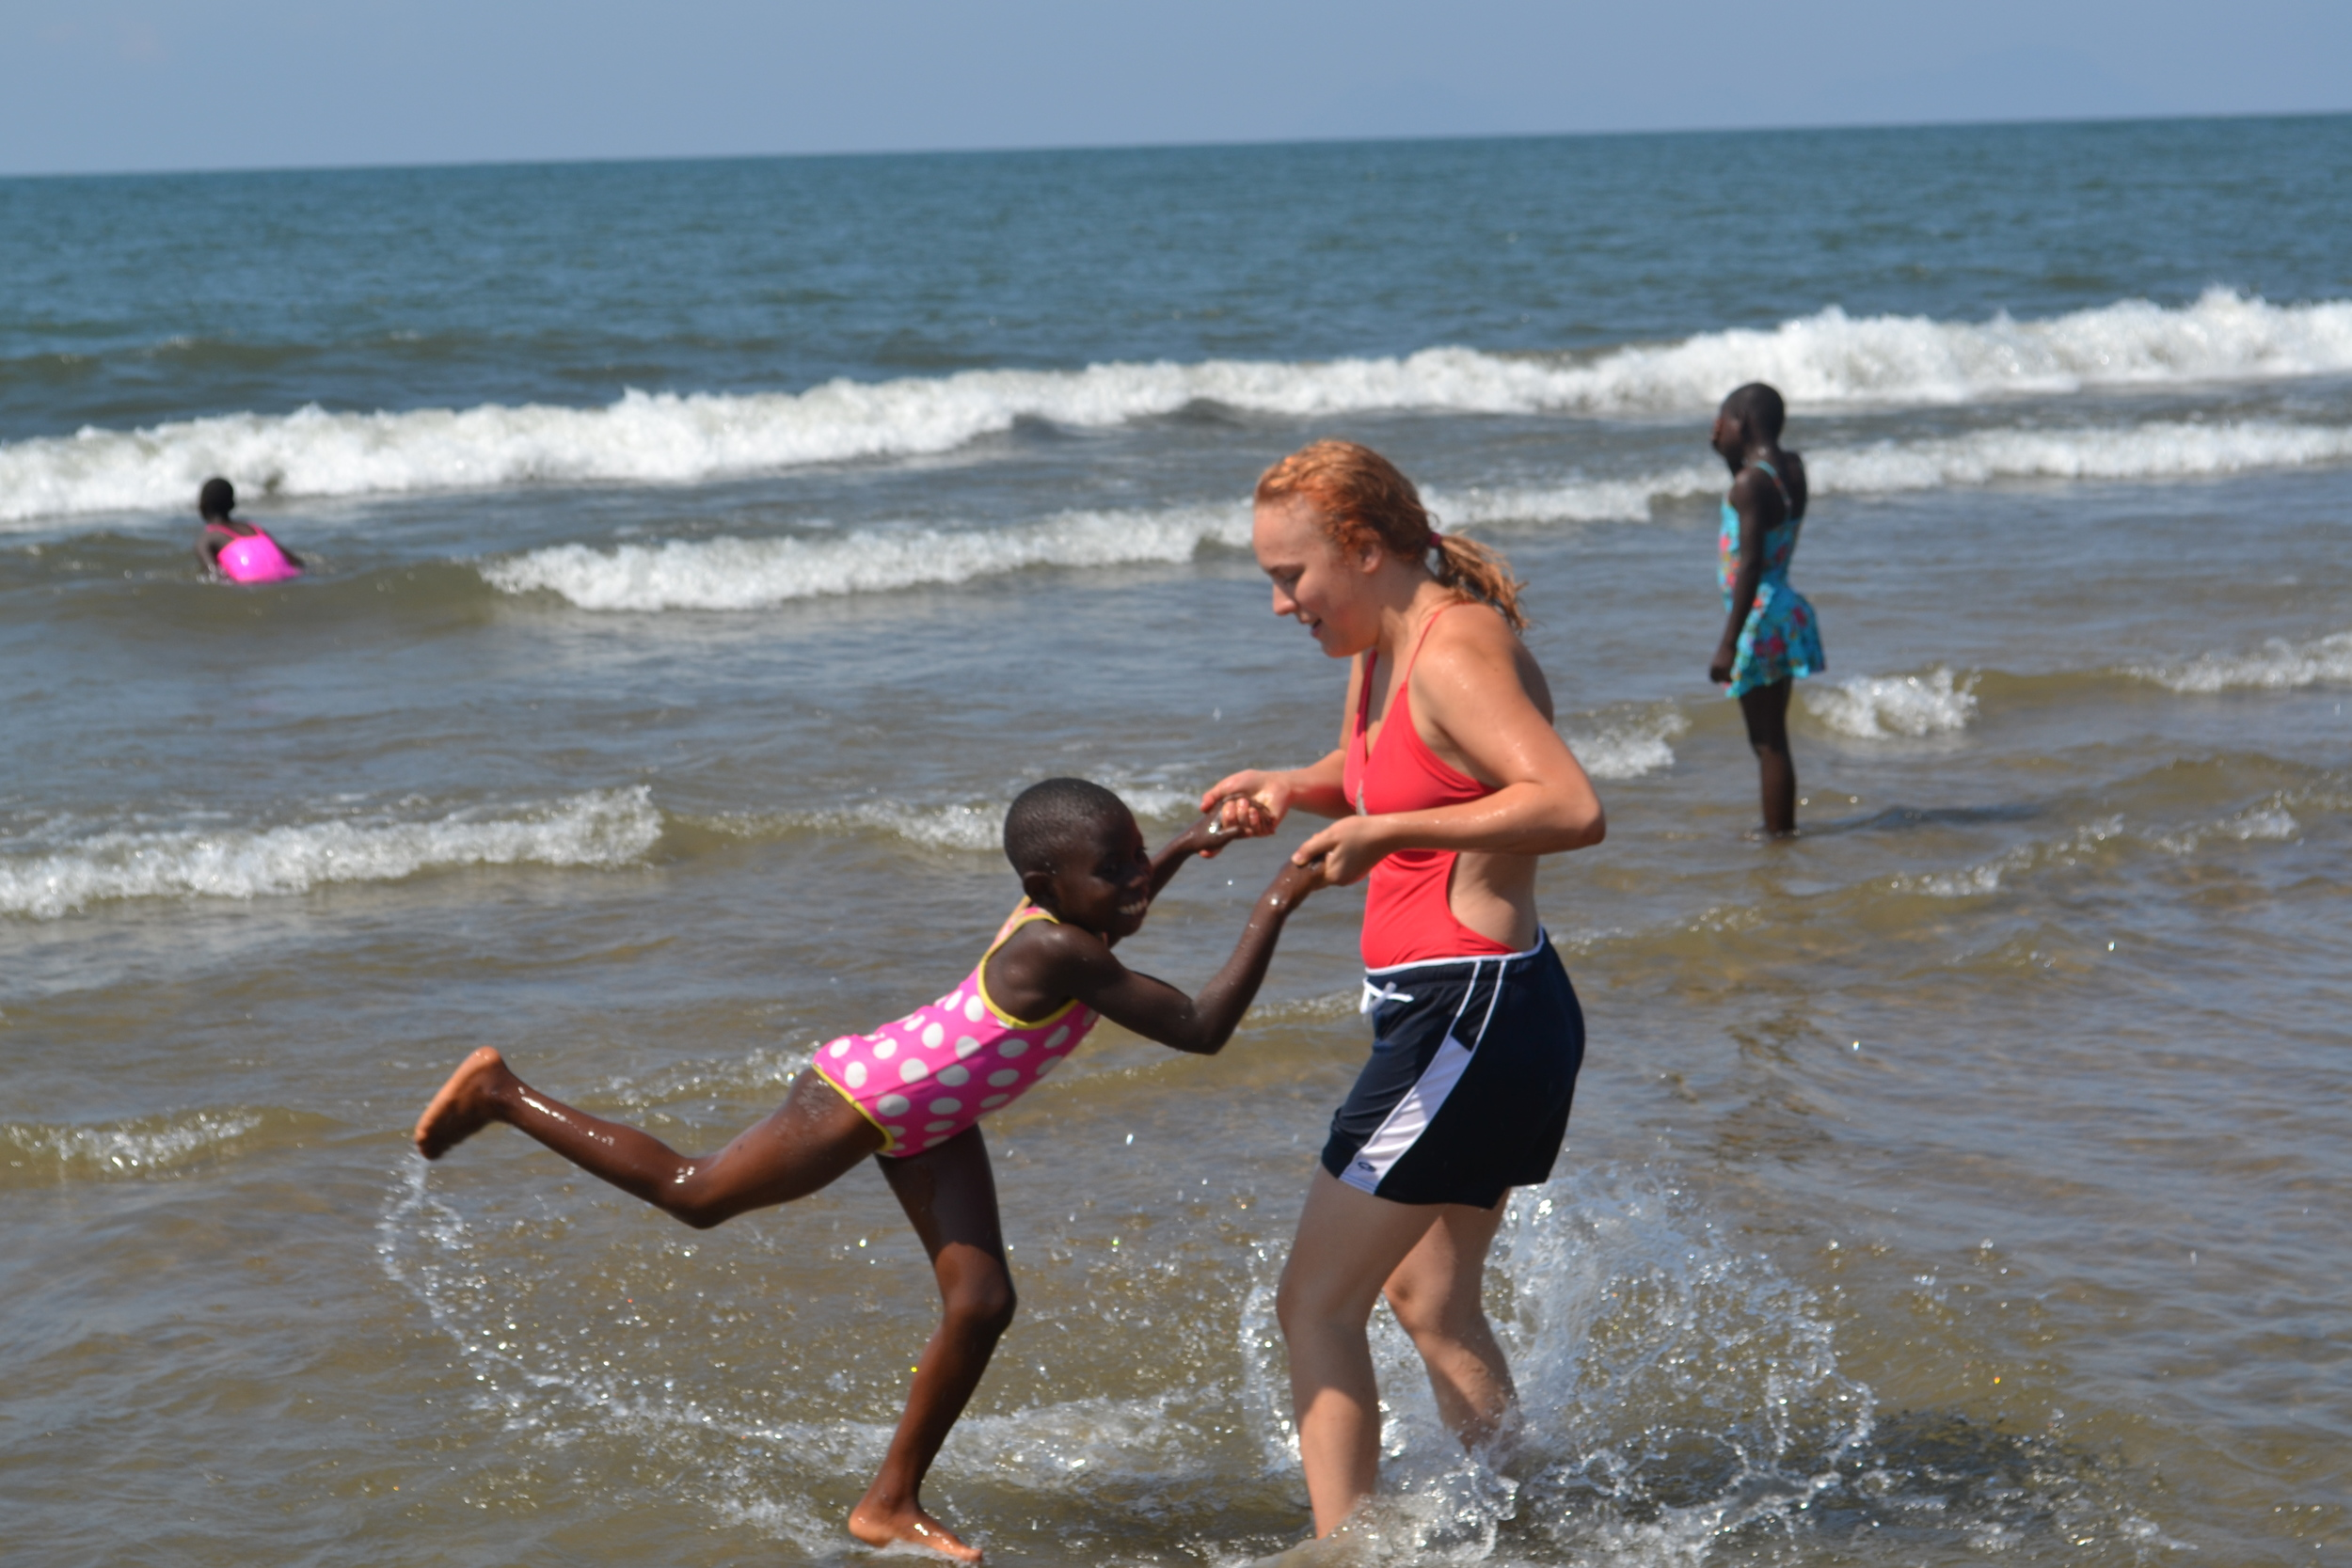 Amanda and Alinafe dancing in the waves.